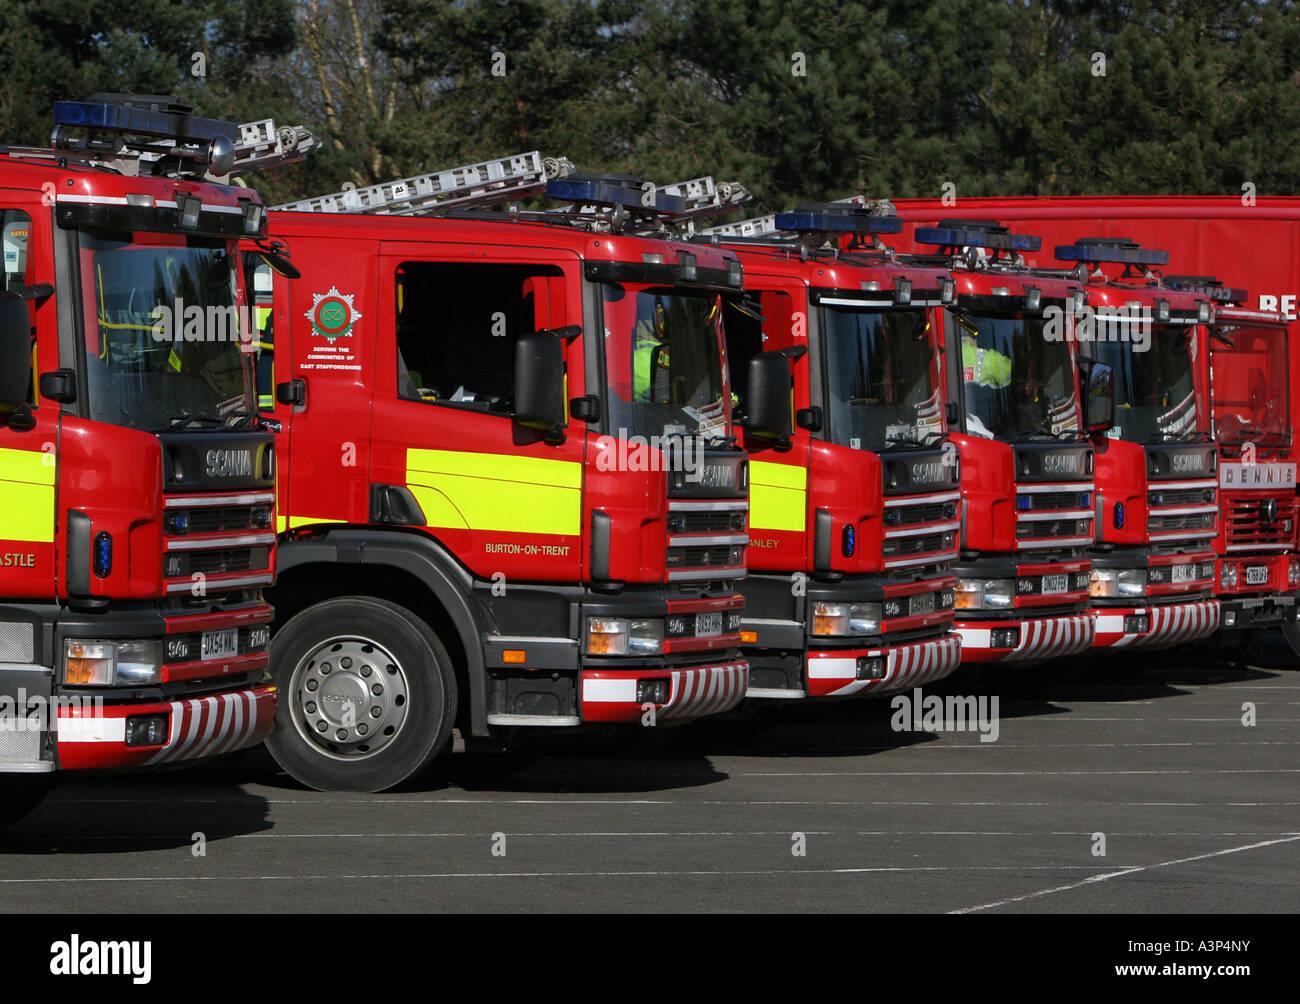 UK fire engines - Stock Image